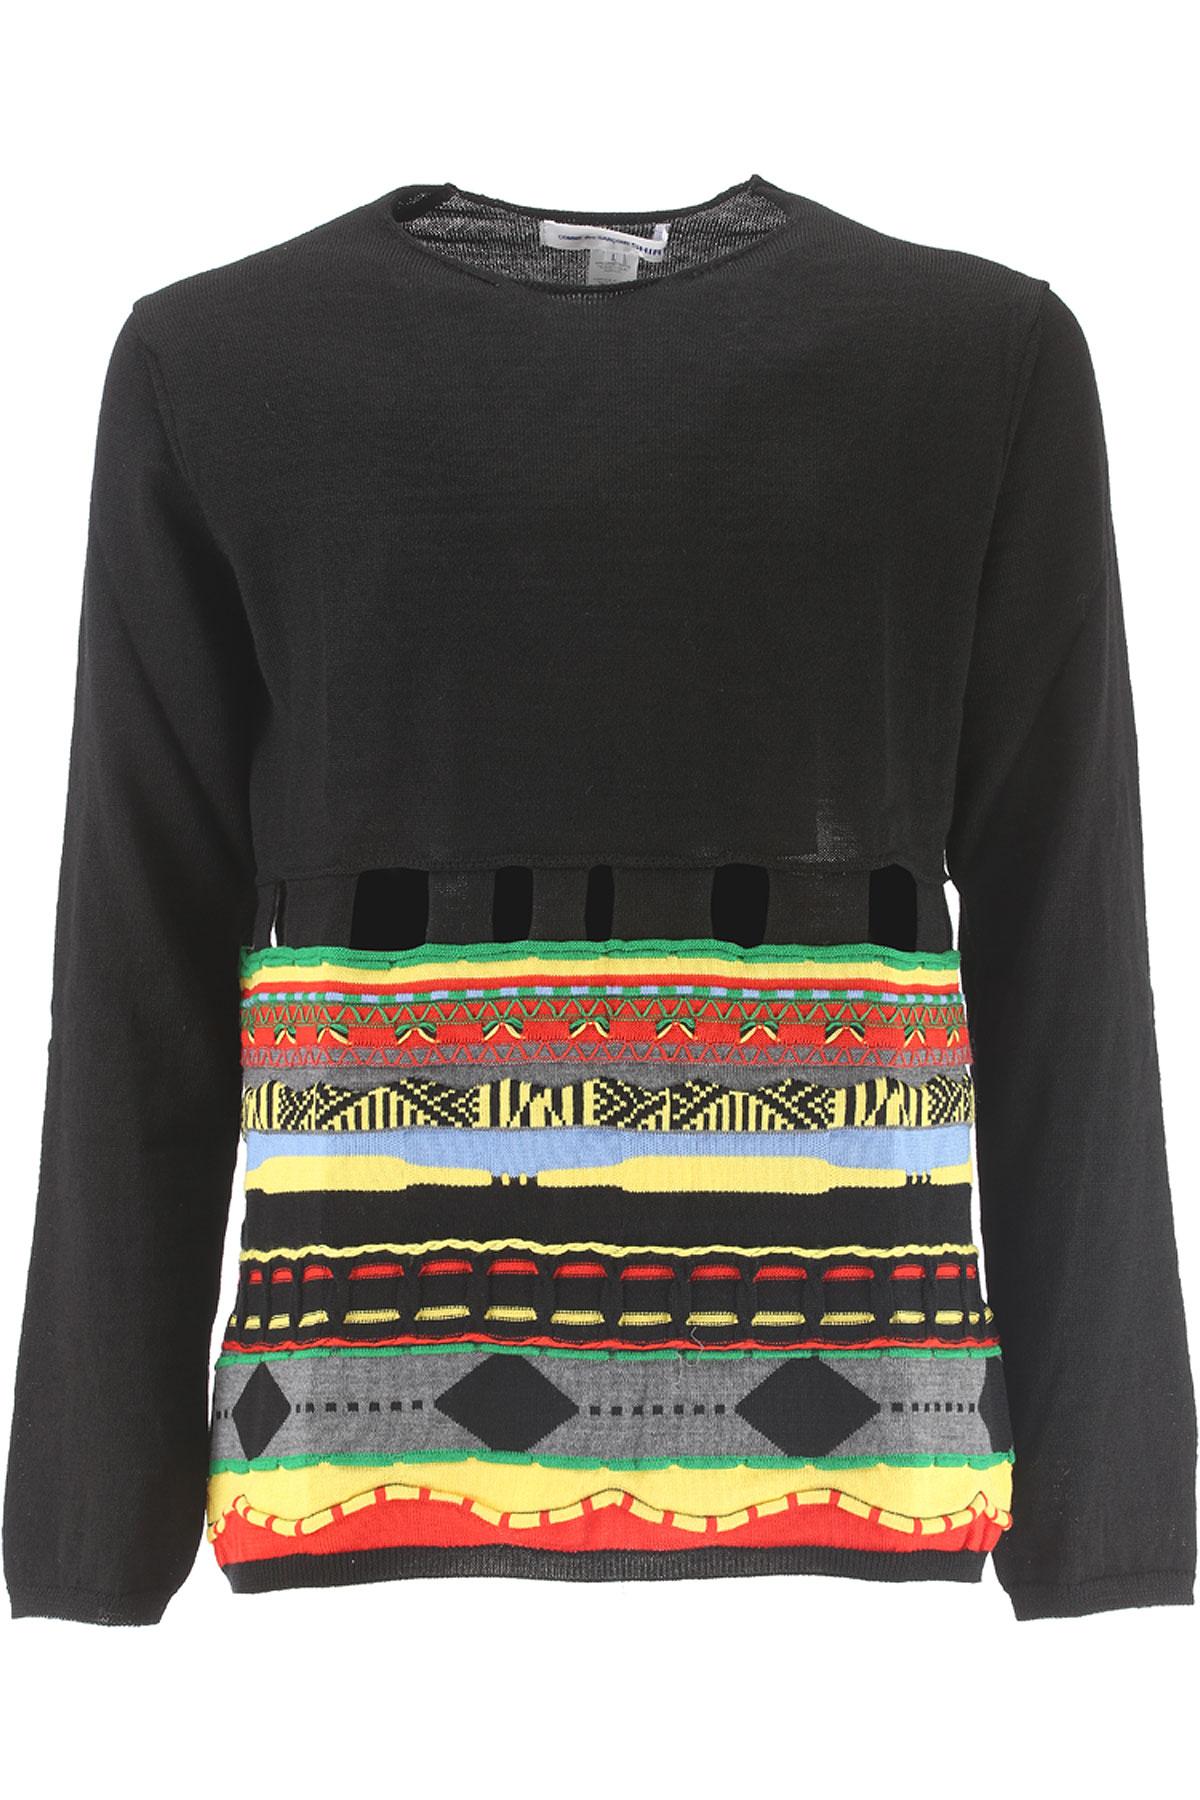 Comme des Garcons Sweater for Men Jumper On Sale, Black, Wool, 2017, L M S USA-372992